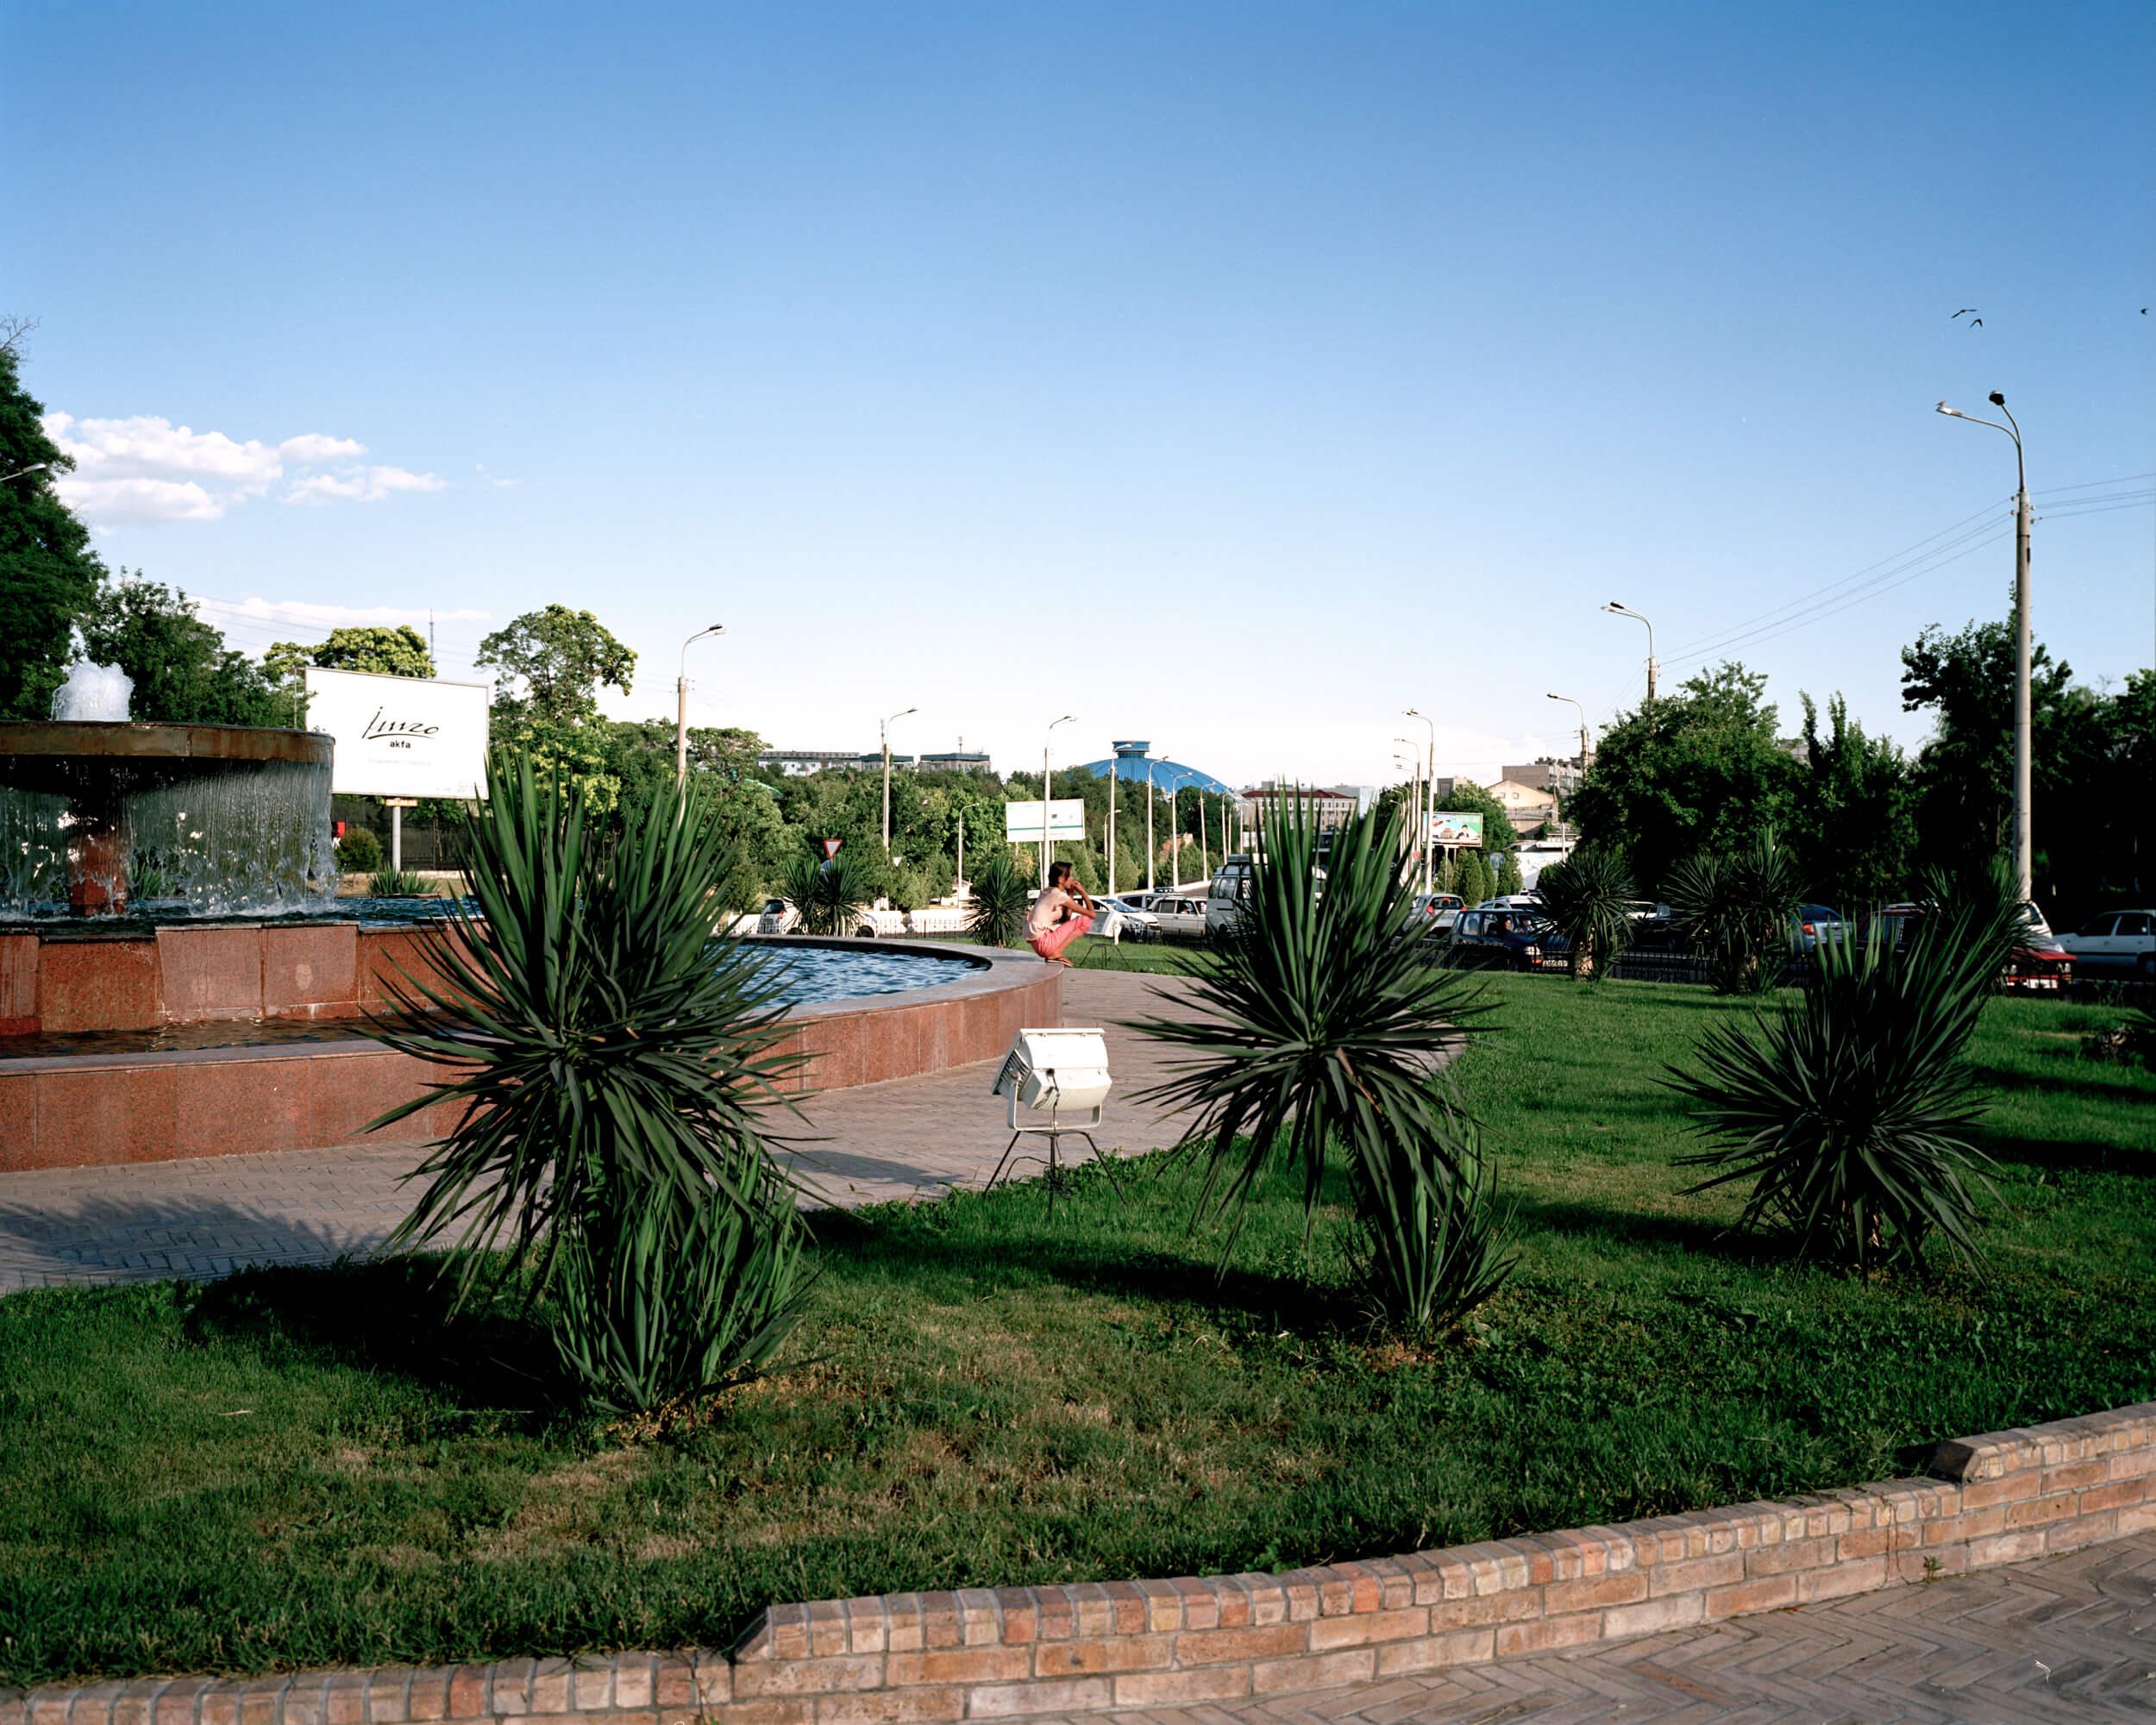 marco-barbieri-water-in-the-desert-21.jpg